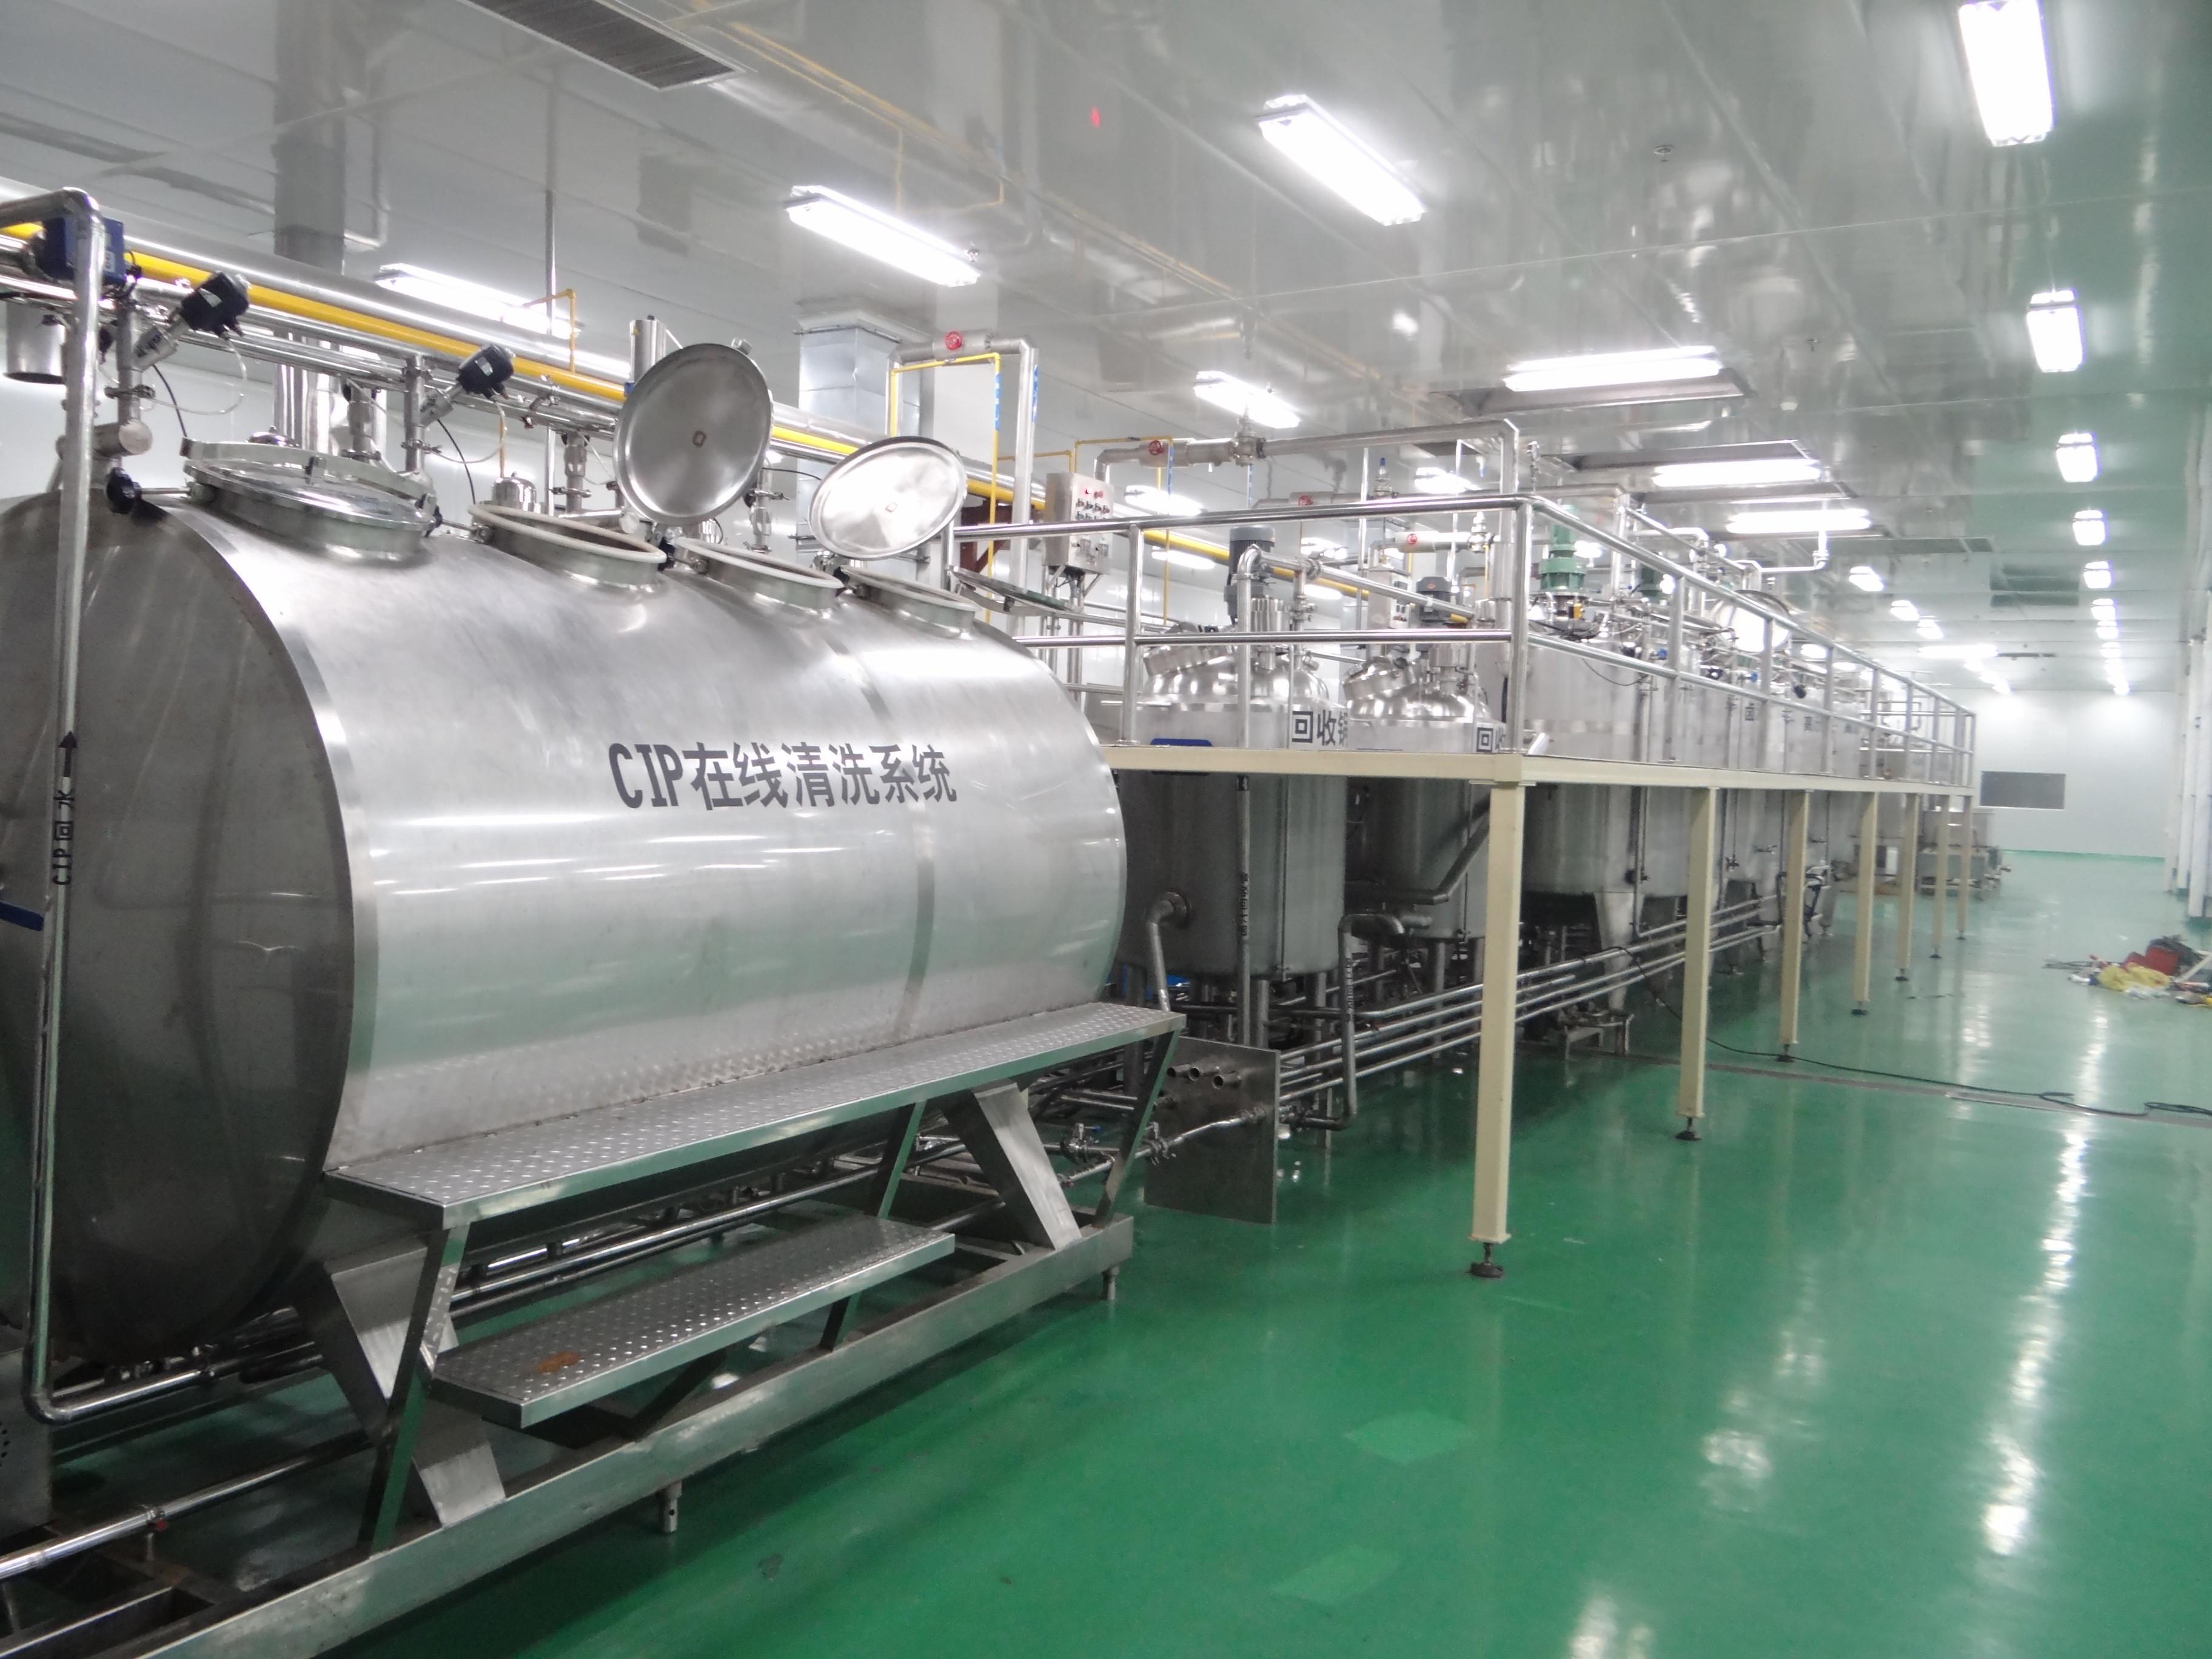 Food Grade Tube UHT Sterilizer Dairy Milk Processing Equipment Fully Automatic